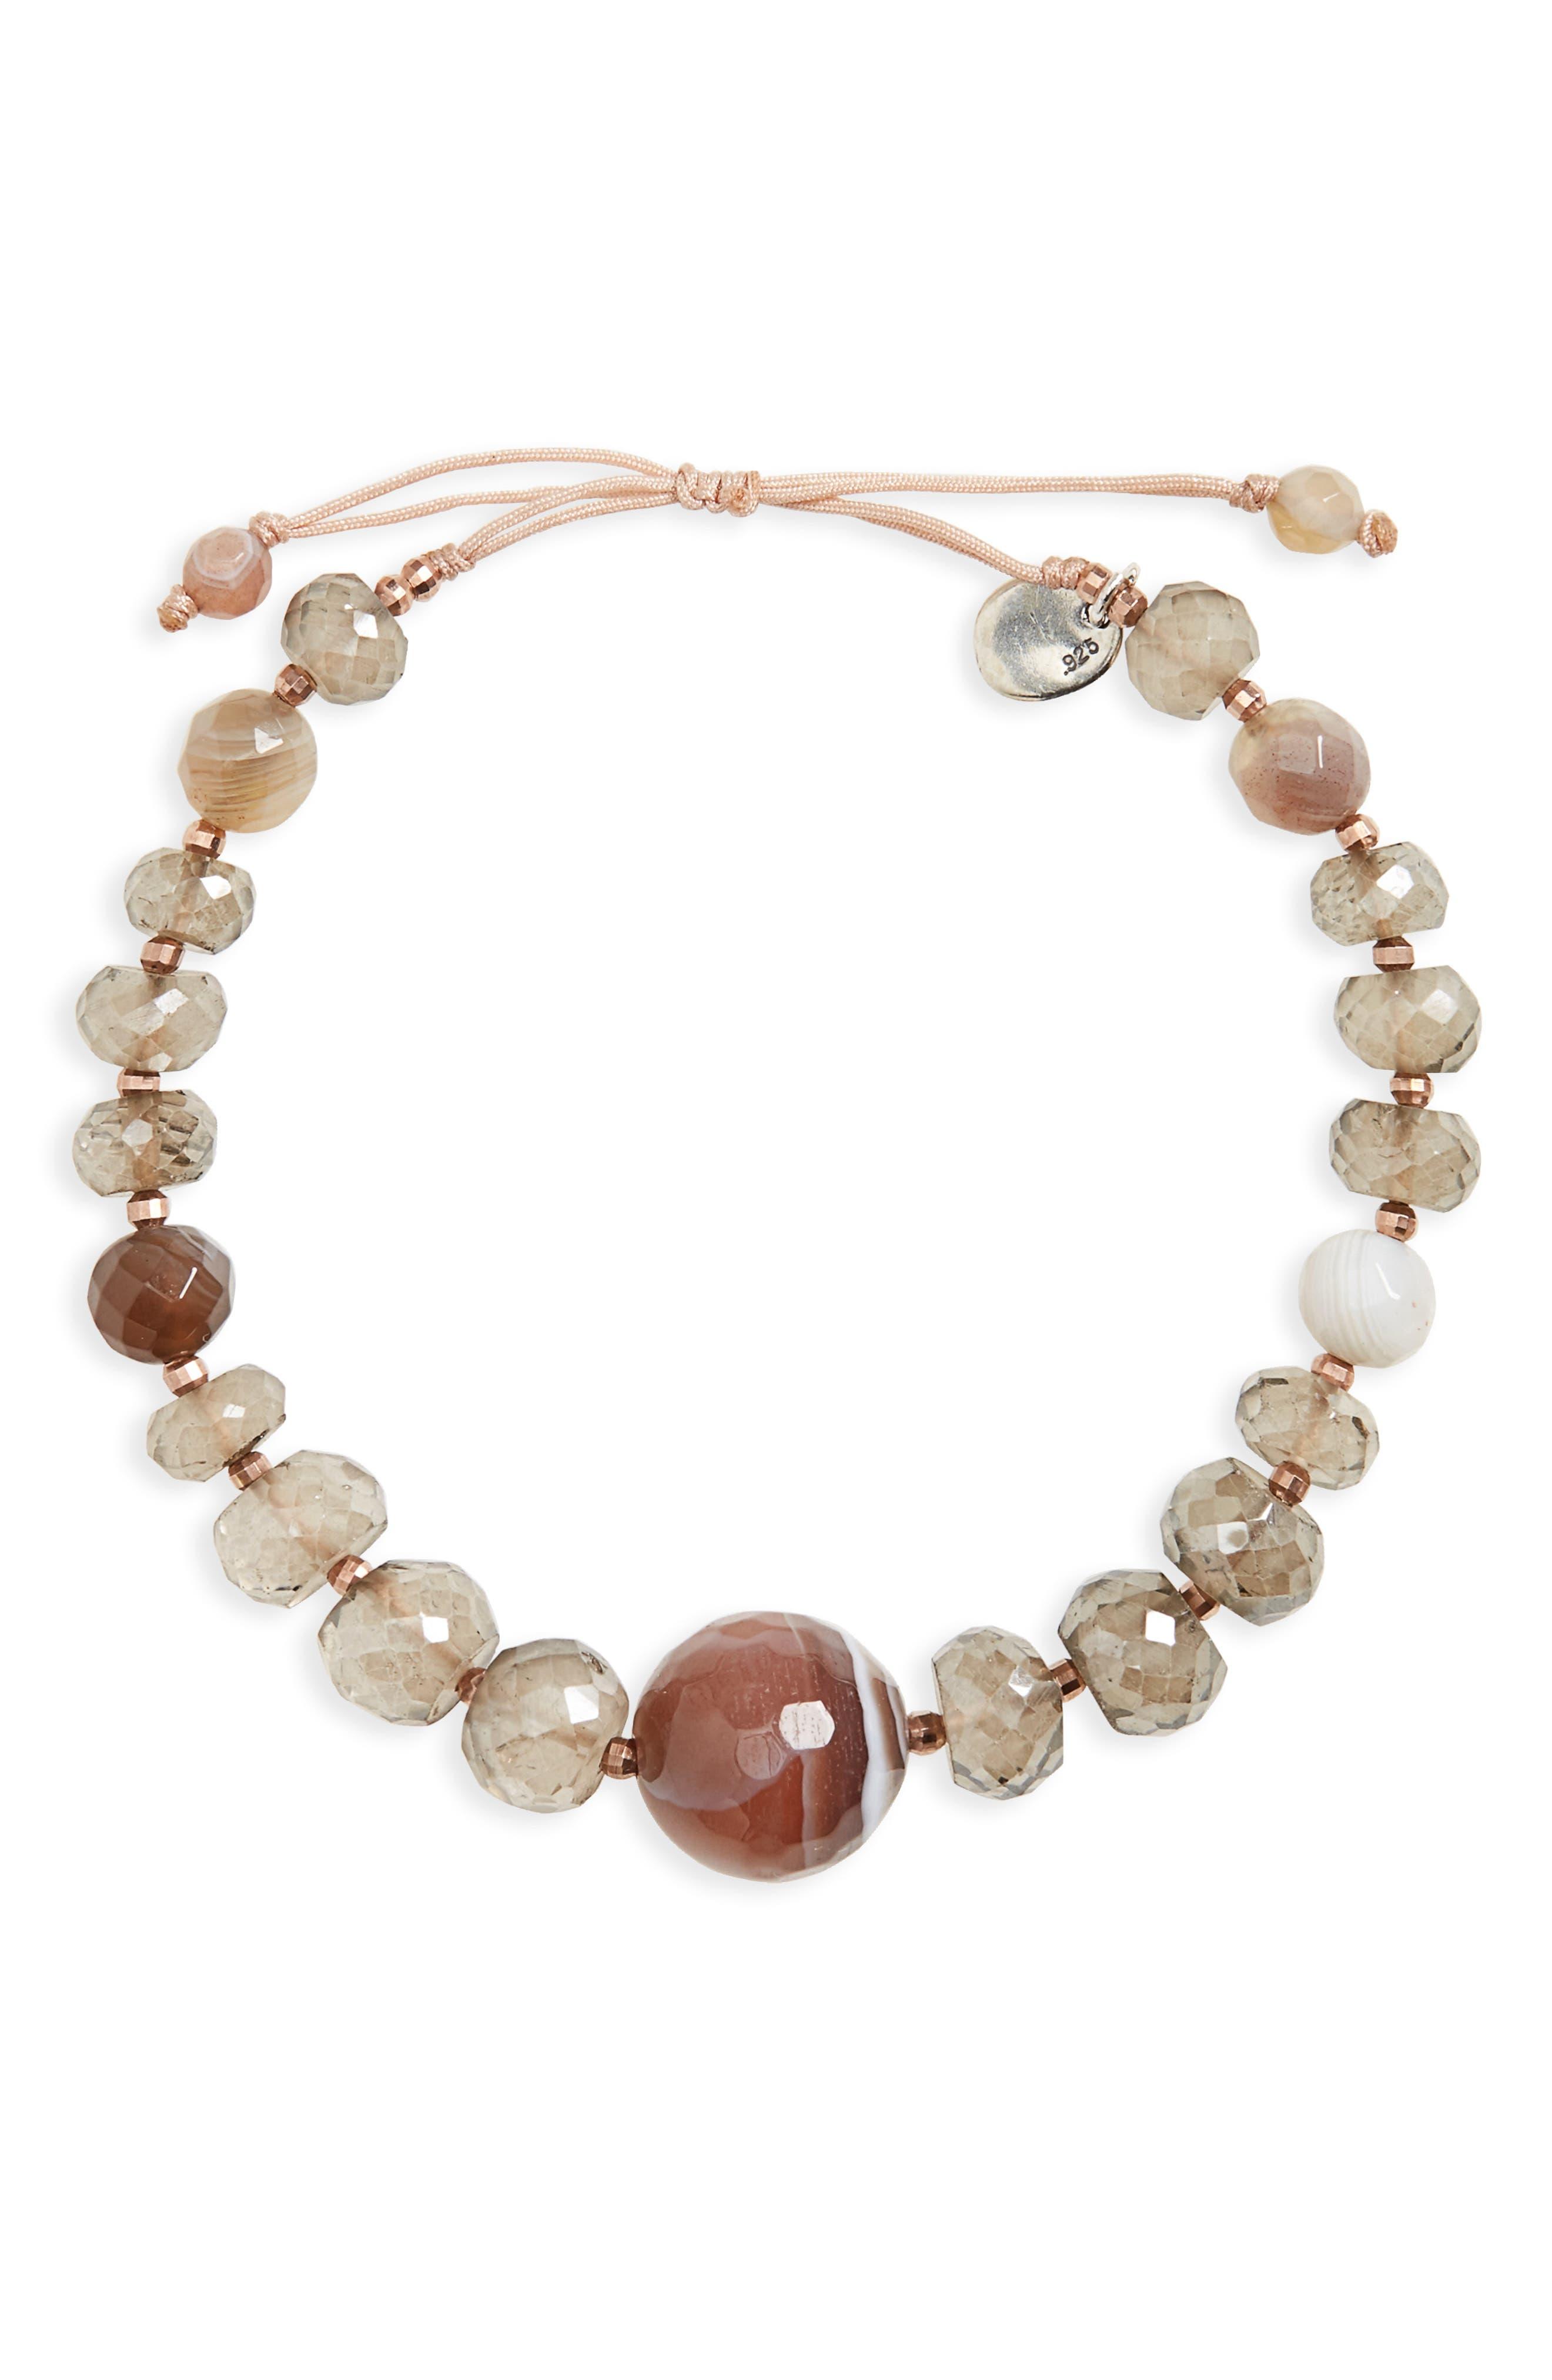 Alternate Image 1 Selected - Chan Luu Semiprecious Stone Beaded Bracelet